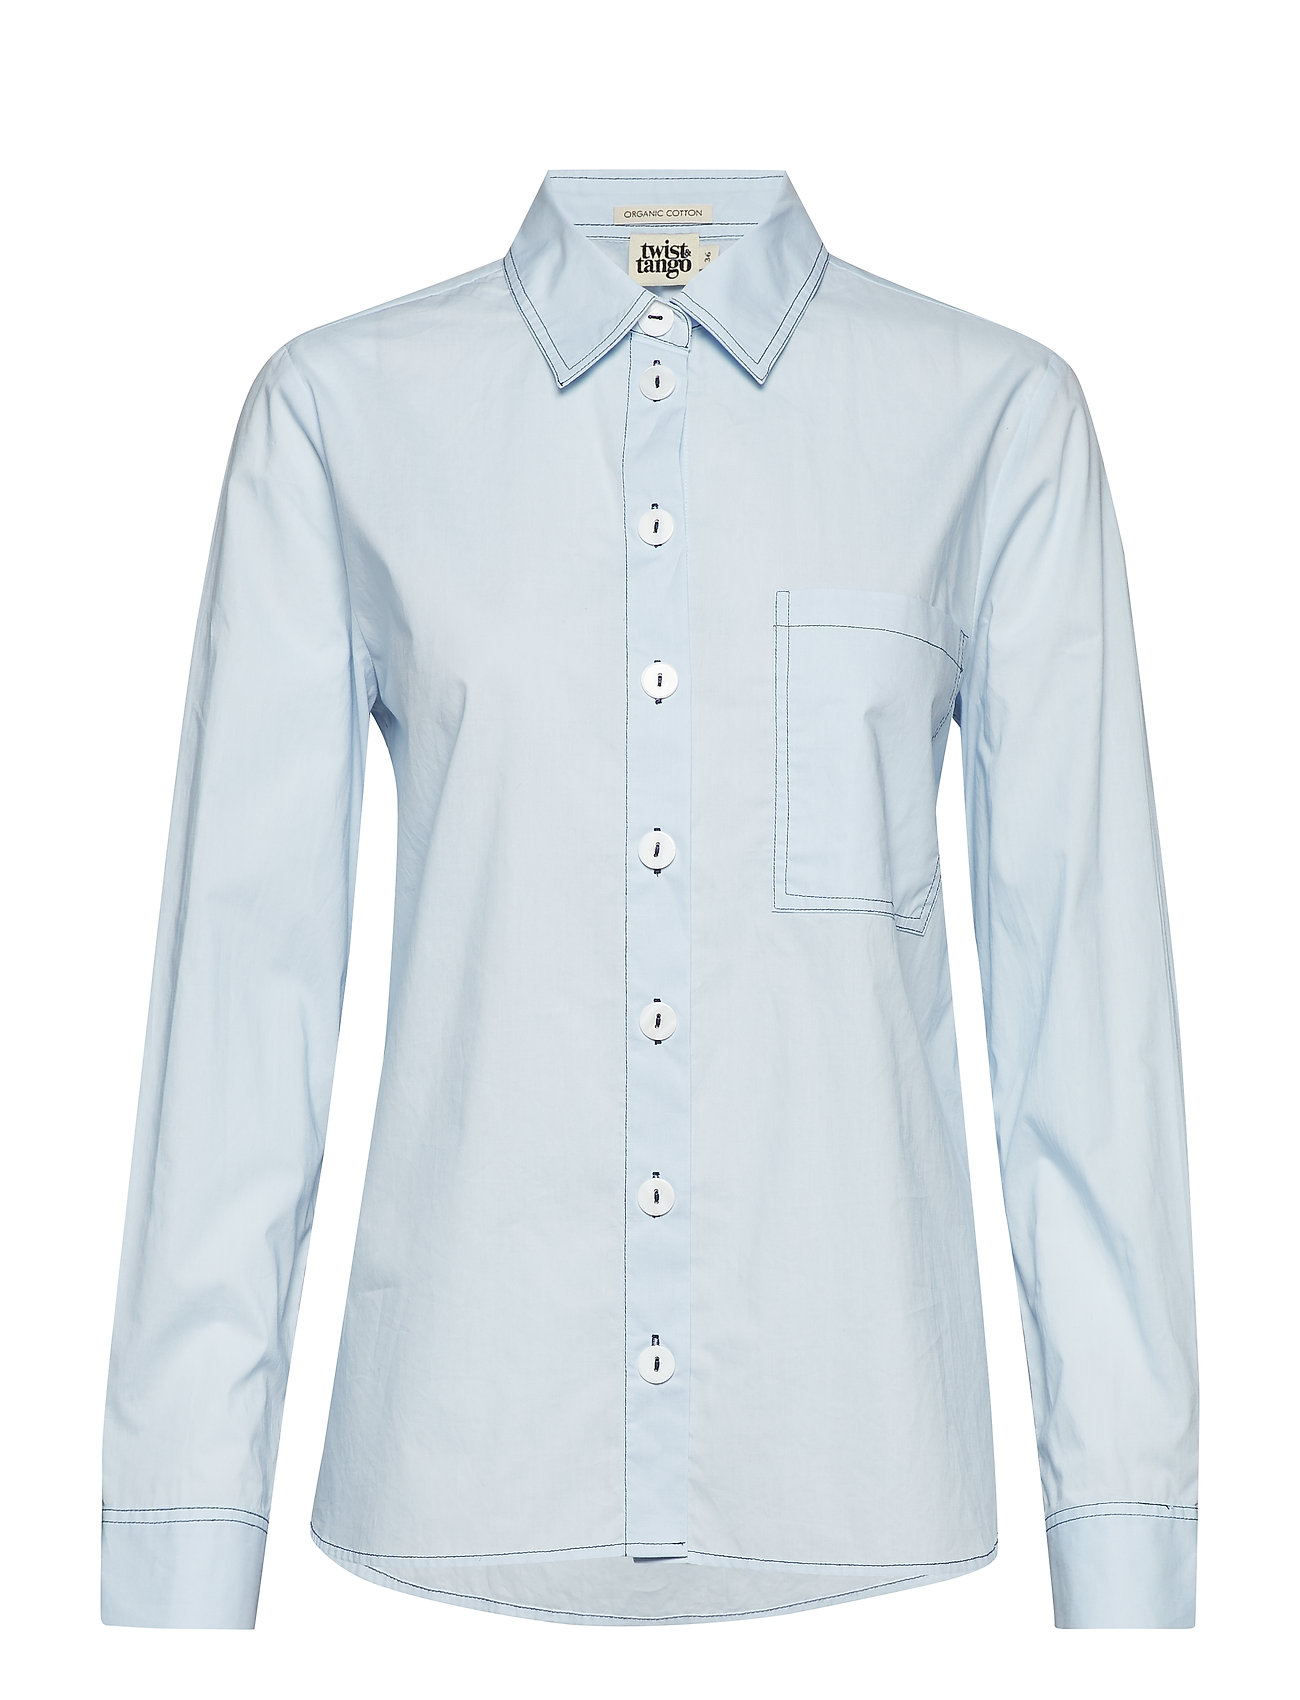 Twist & Tango Dani Shirt Cold Blue - BLUE